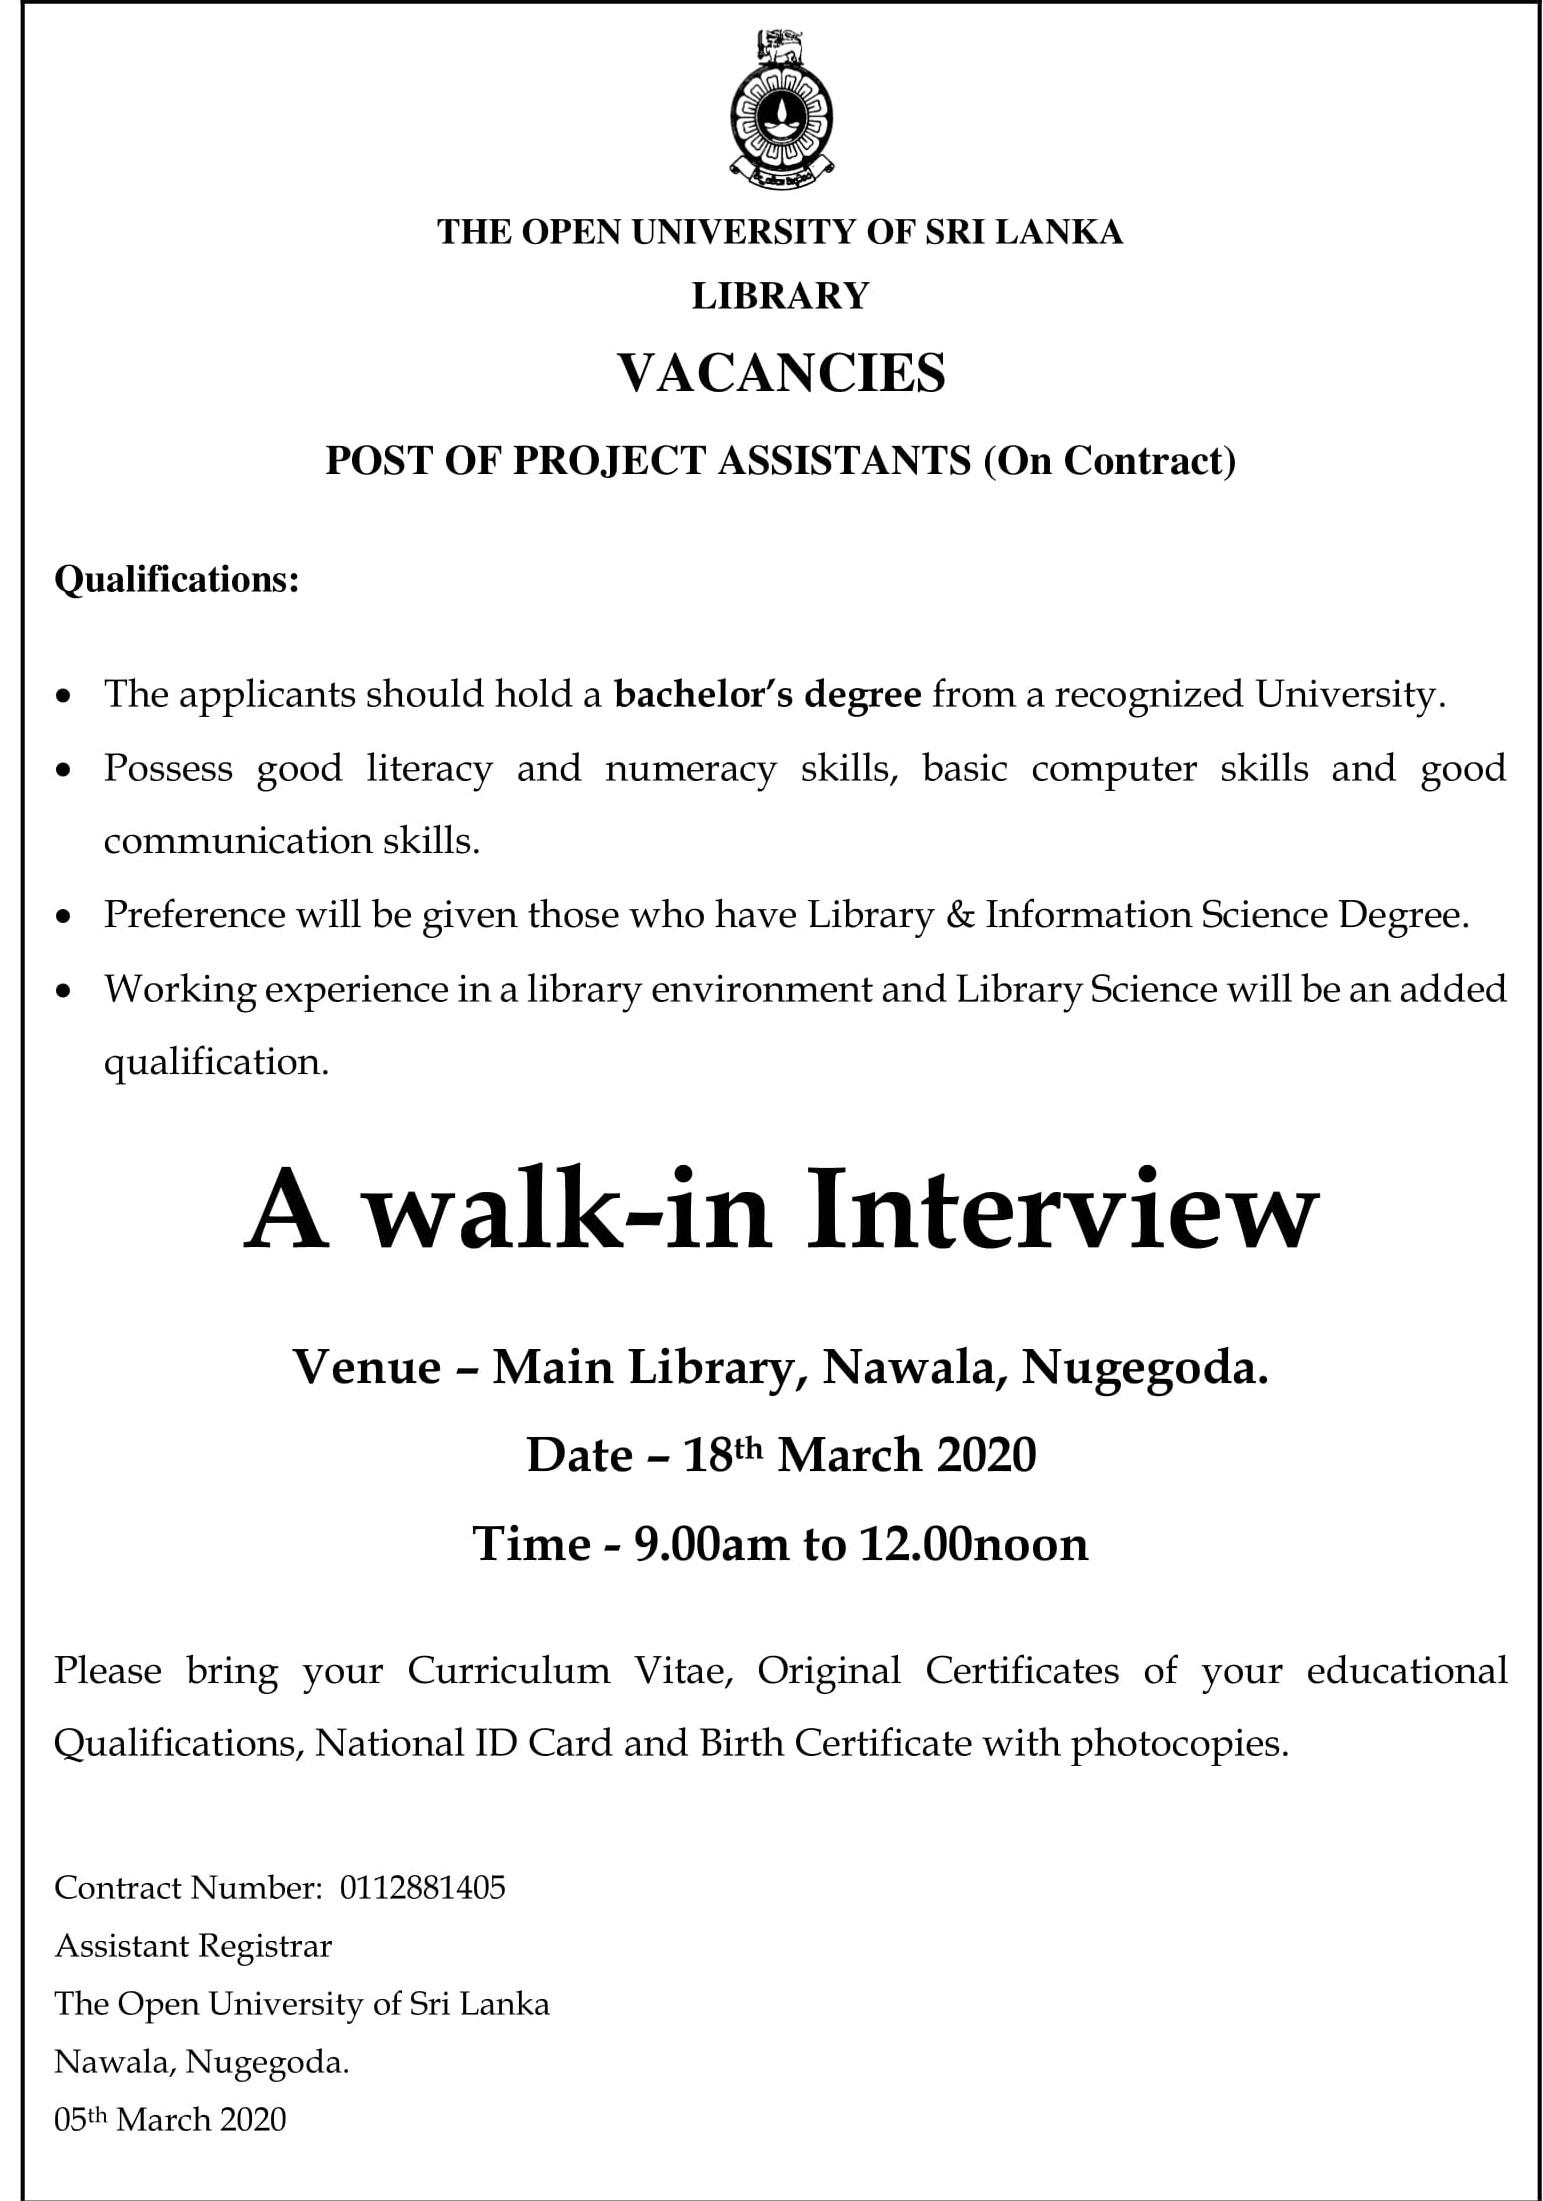 Project Assistant - Open University of Sri Lanka